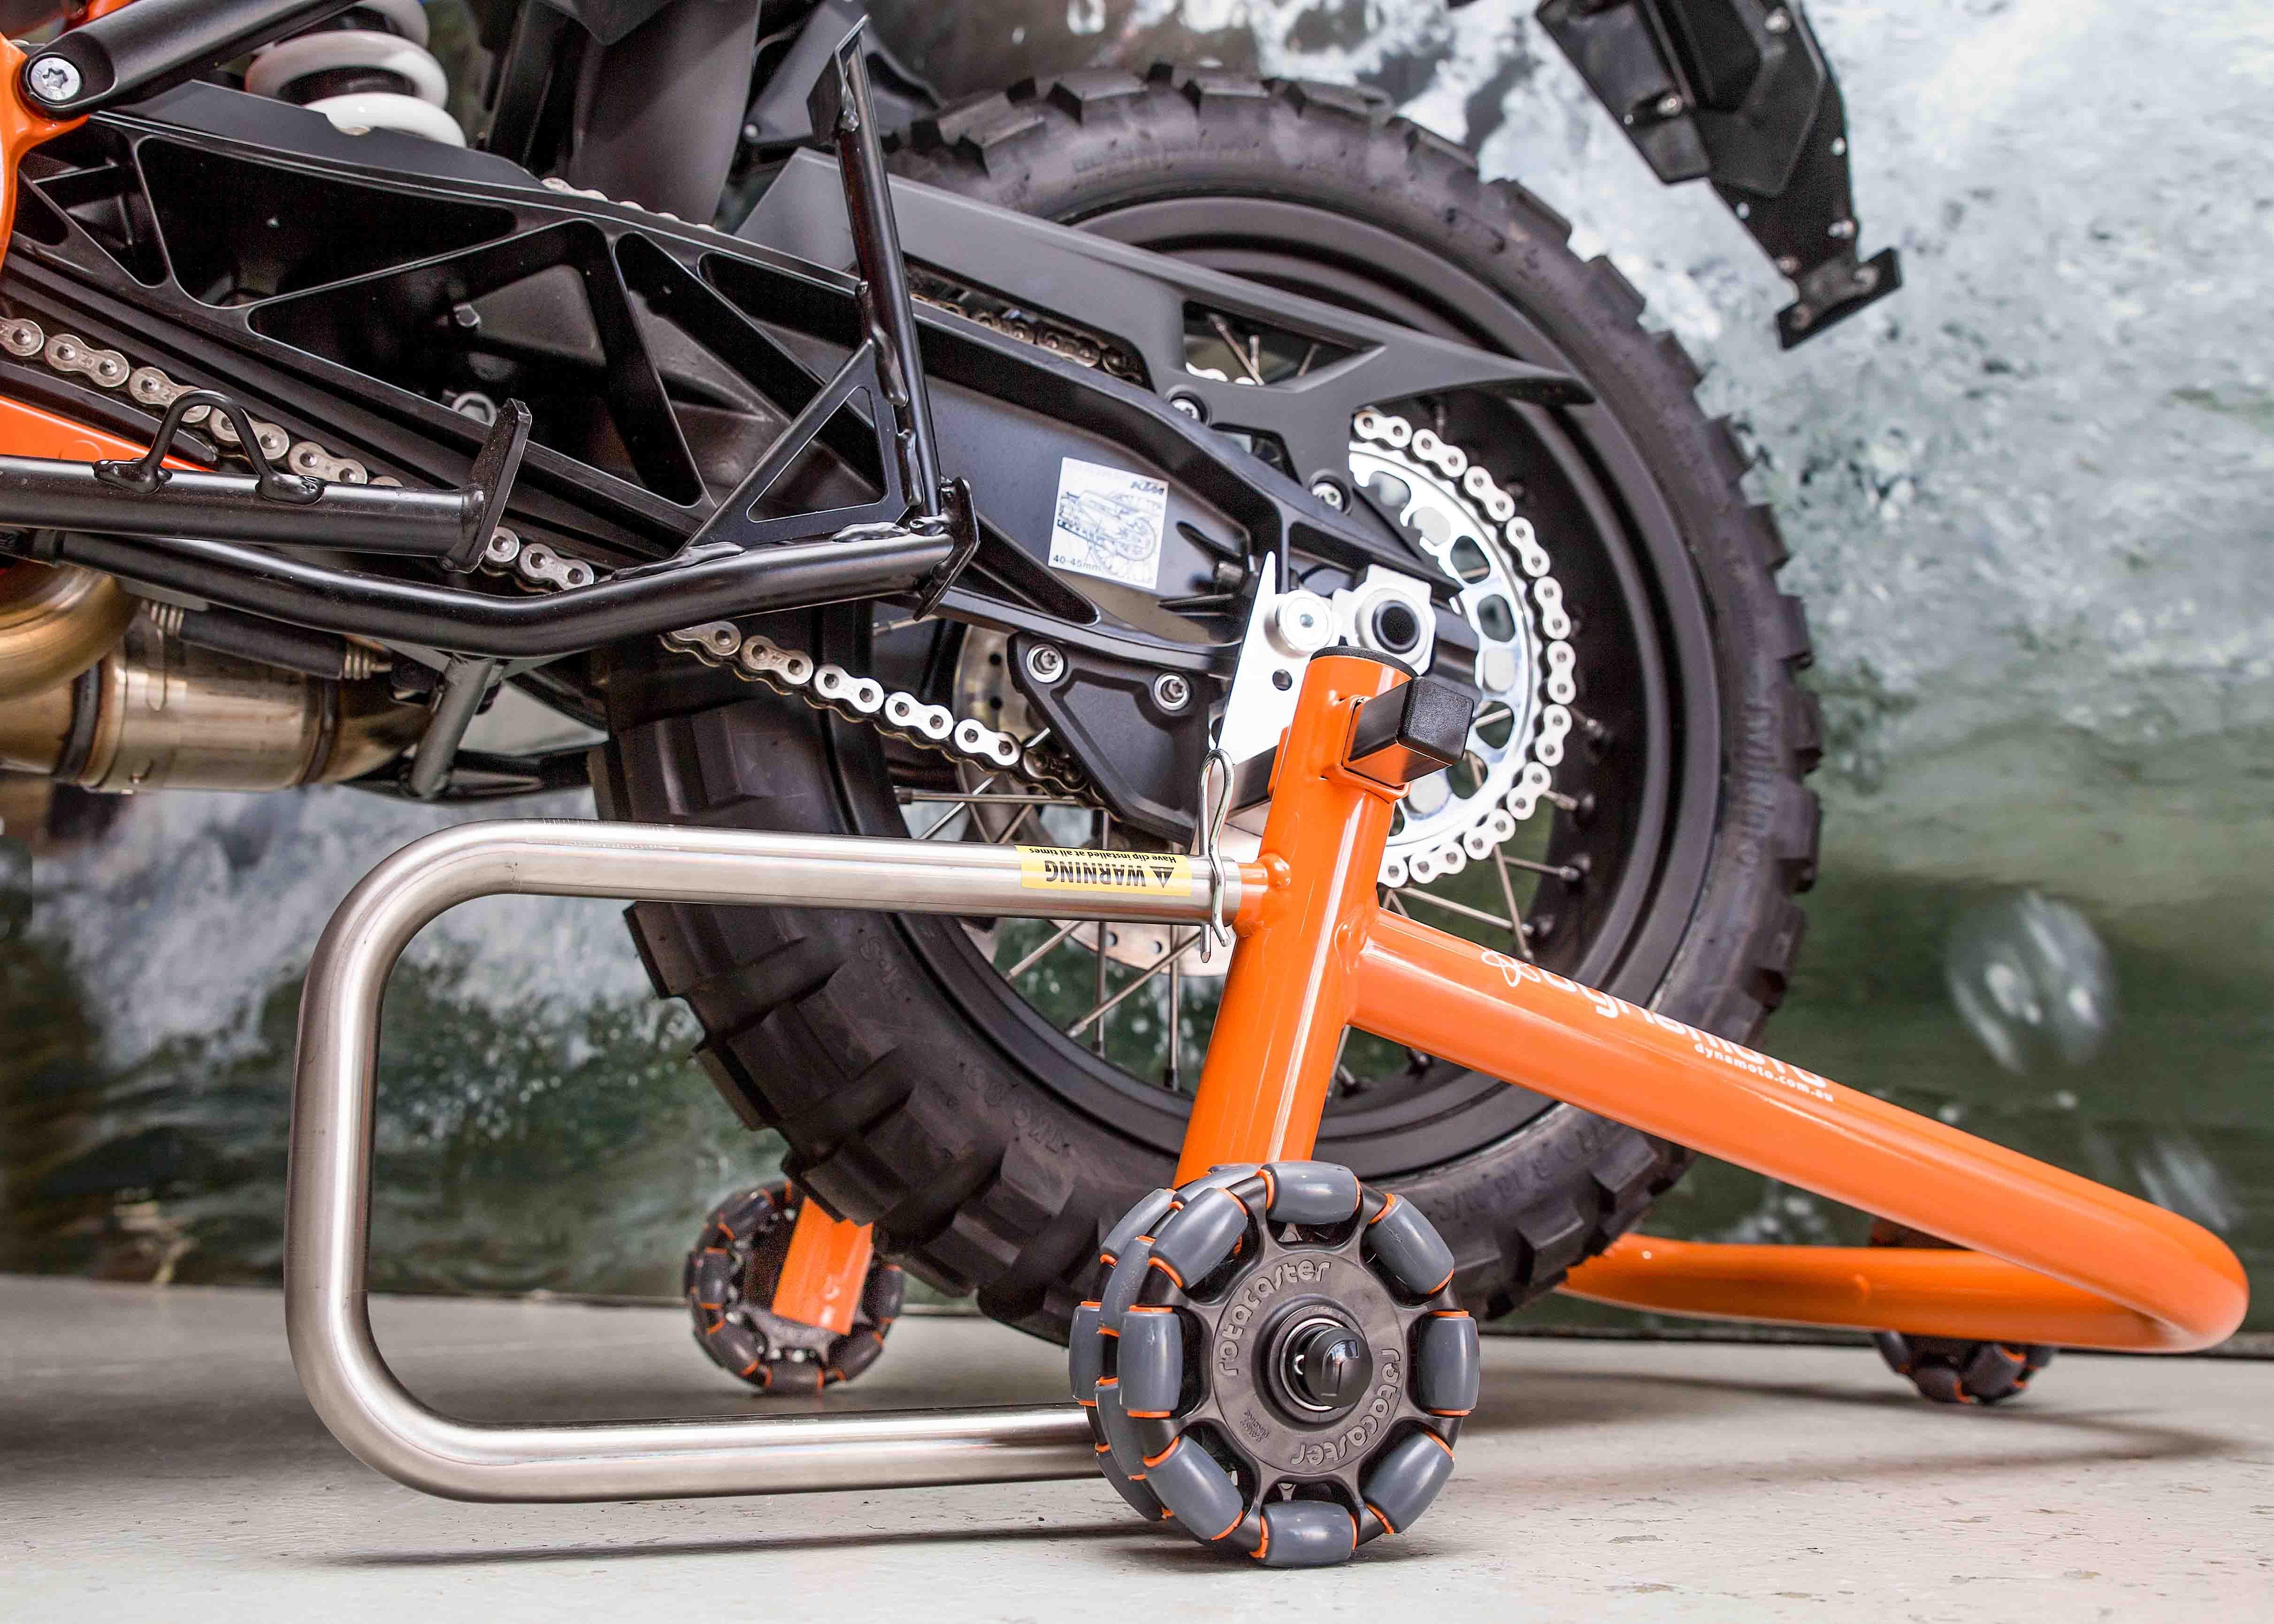 Ktm 1290 Super Adventure R Vs Dynamoto Dolly Stand Motorcycle Storage Motorcycle Super Adventure